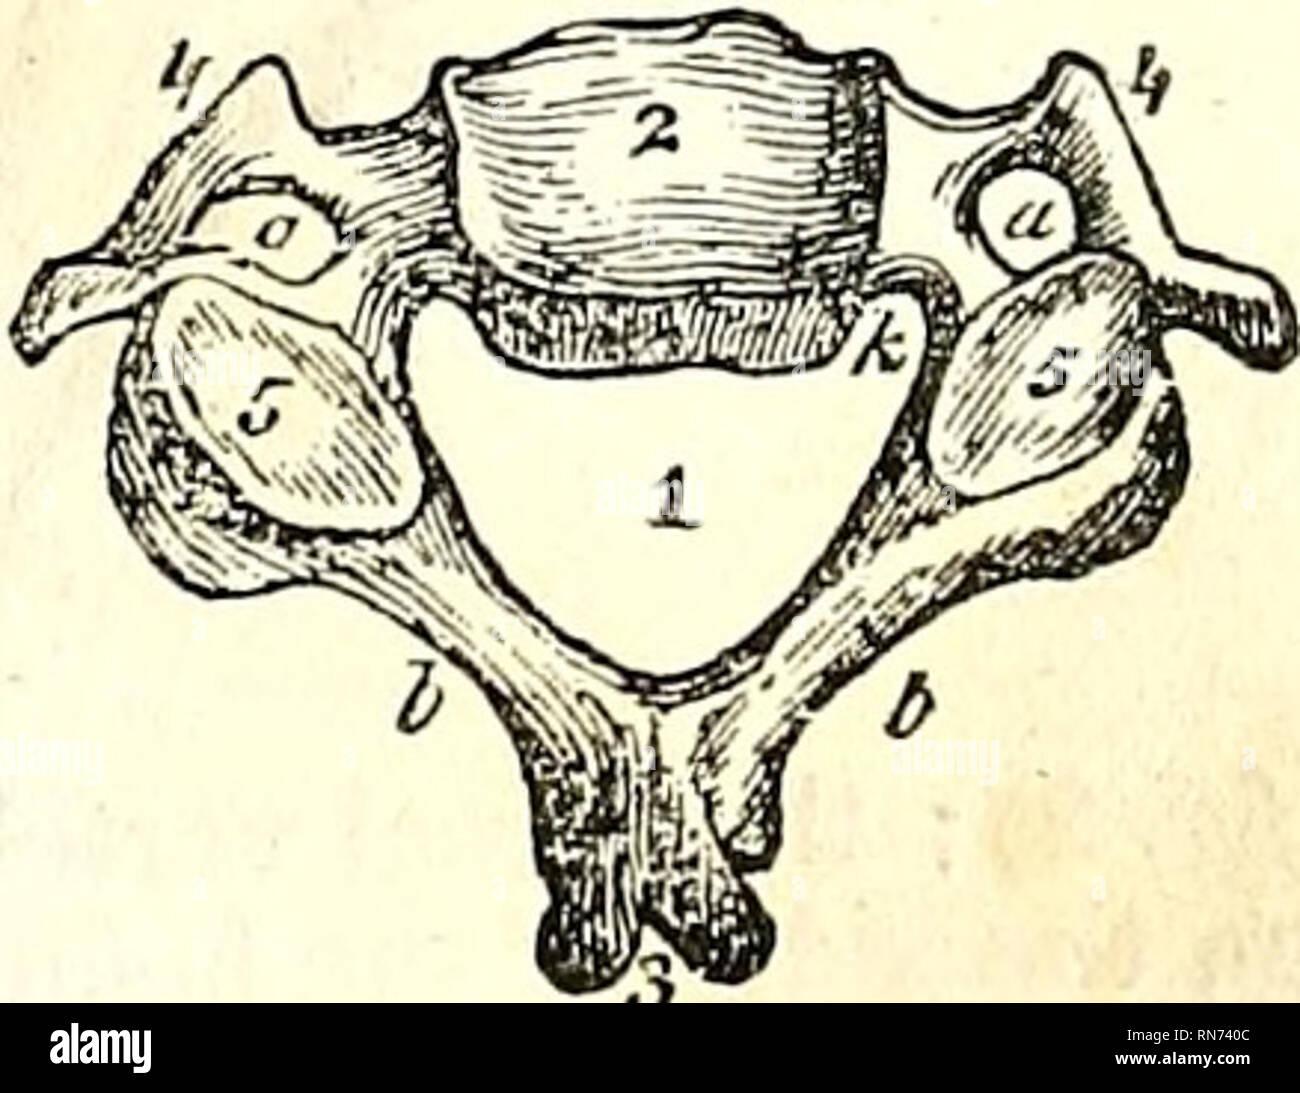 The Anatomy Of The Human Body Human Anatomy Anatomy The Vertebral